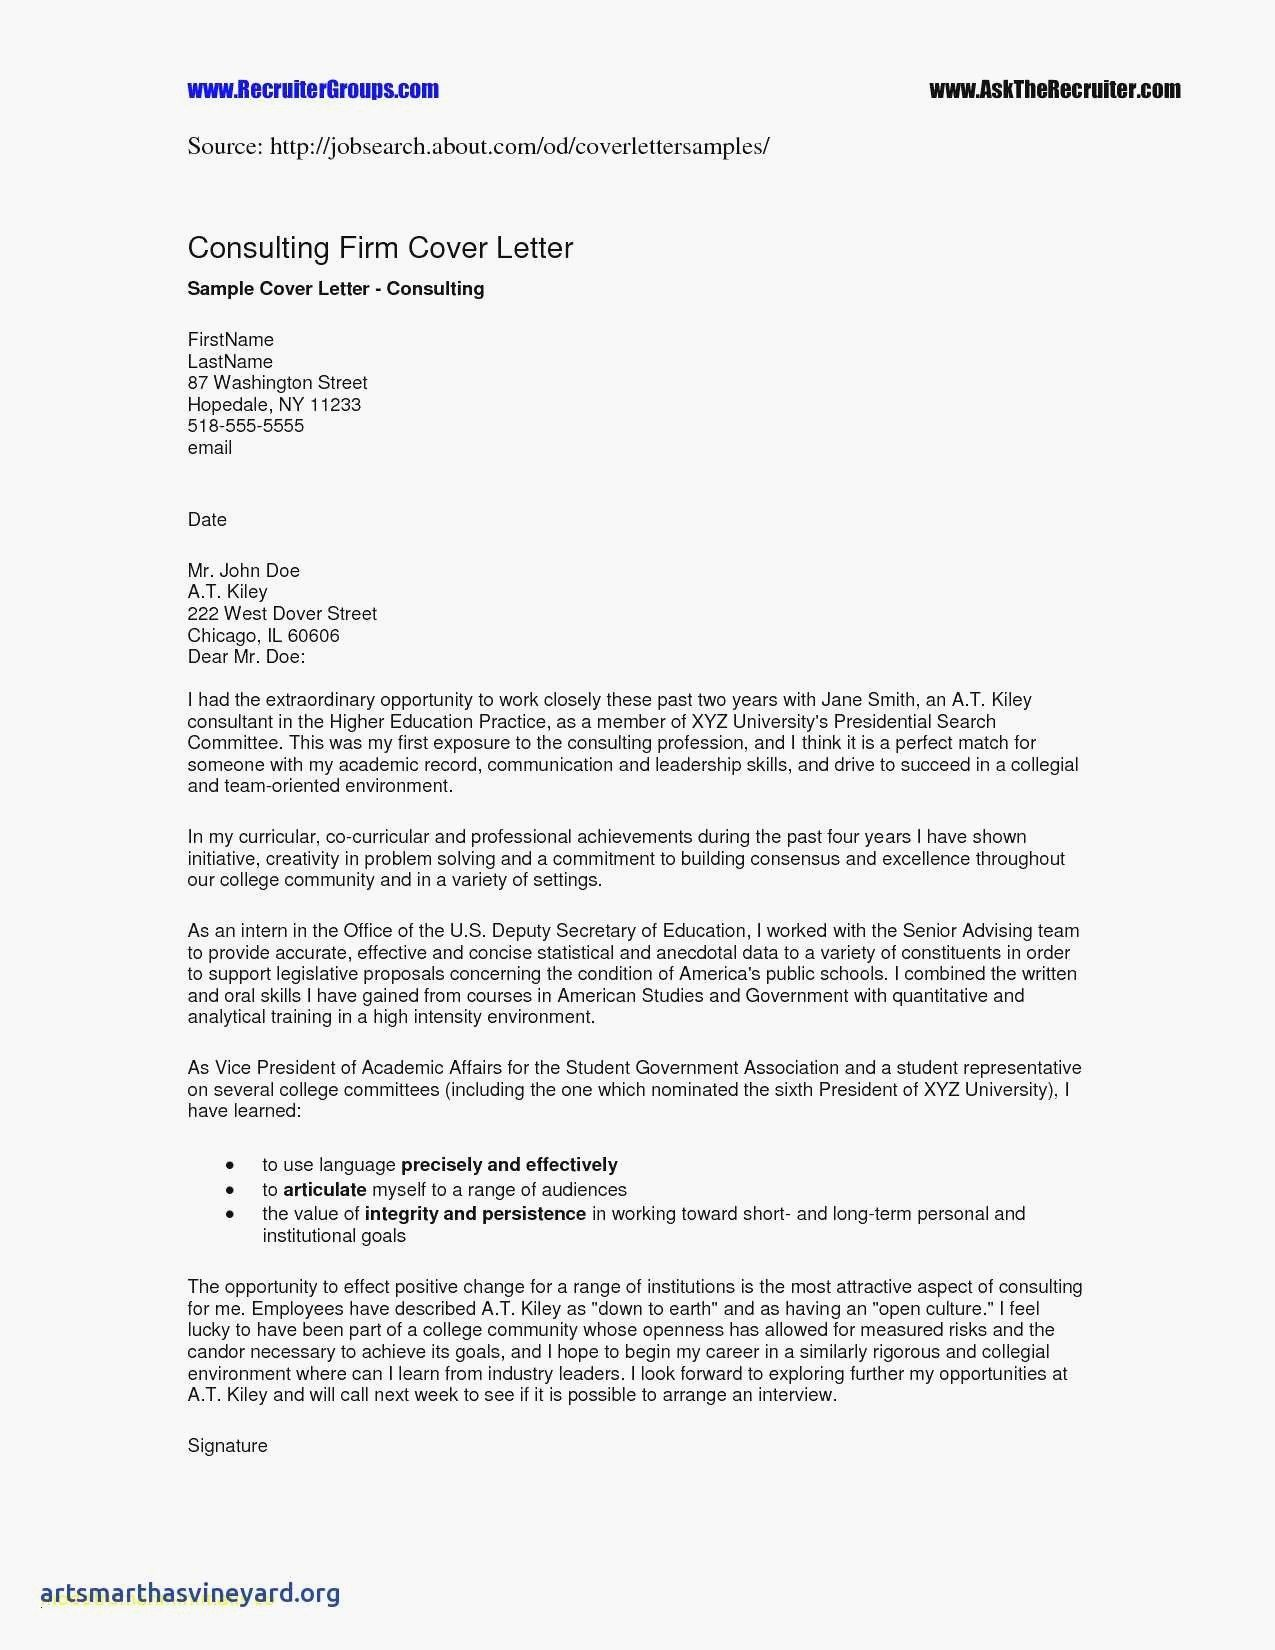 5 Free Sample Cover Letter For Job Application 1